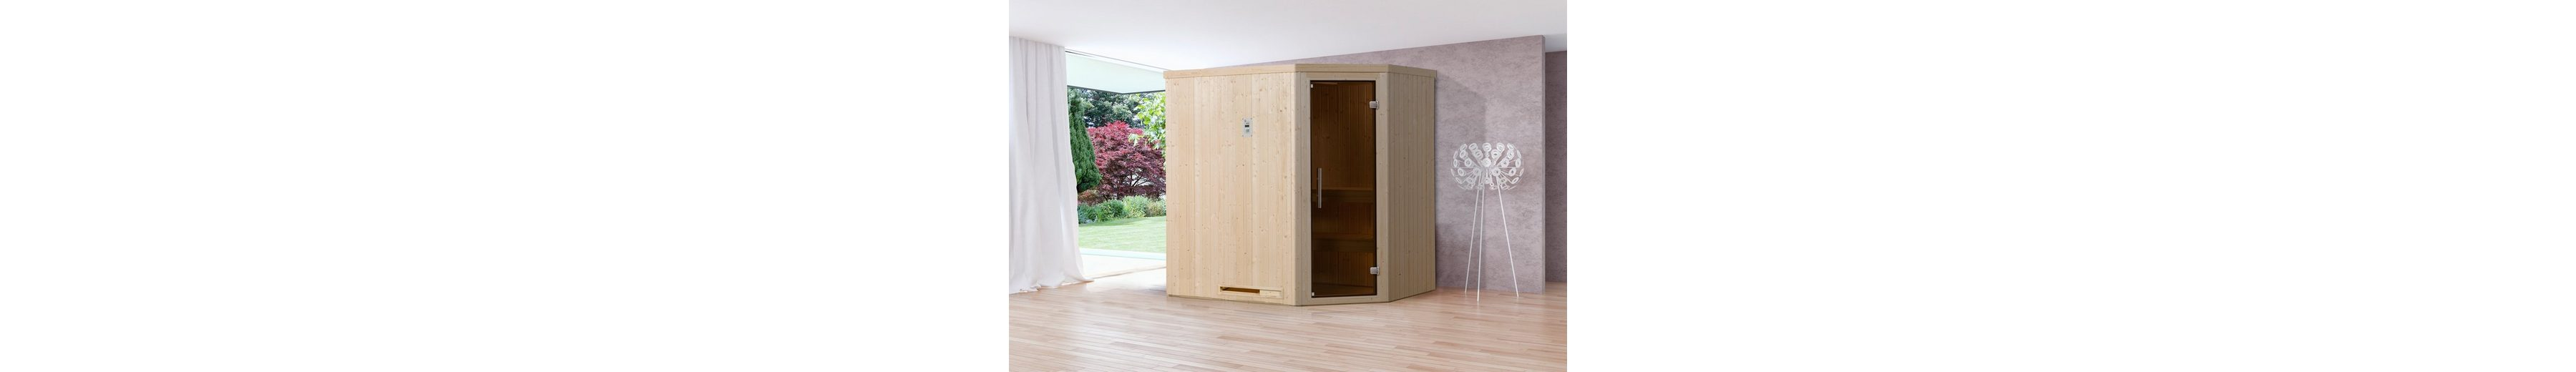 Sauna »Lyngdal 2 Trend Plus BioS«, 192/141/199 cm, 68 mm, 7,5-KW-Bio-Kombiofen